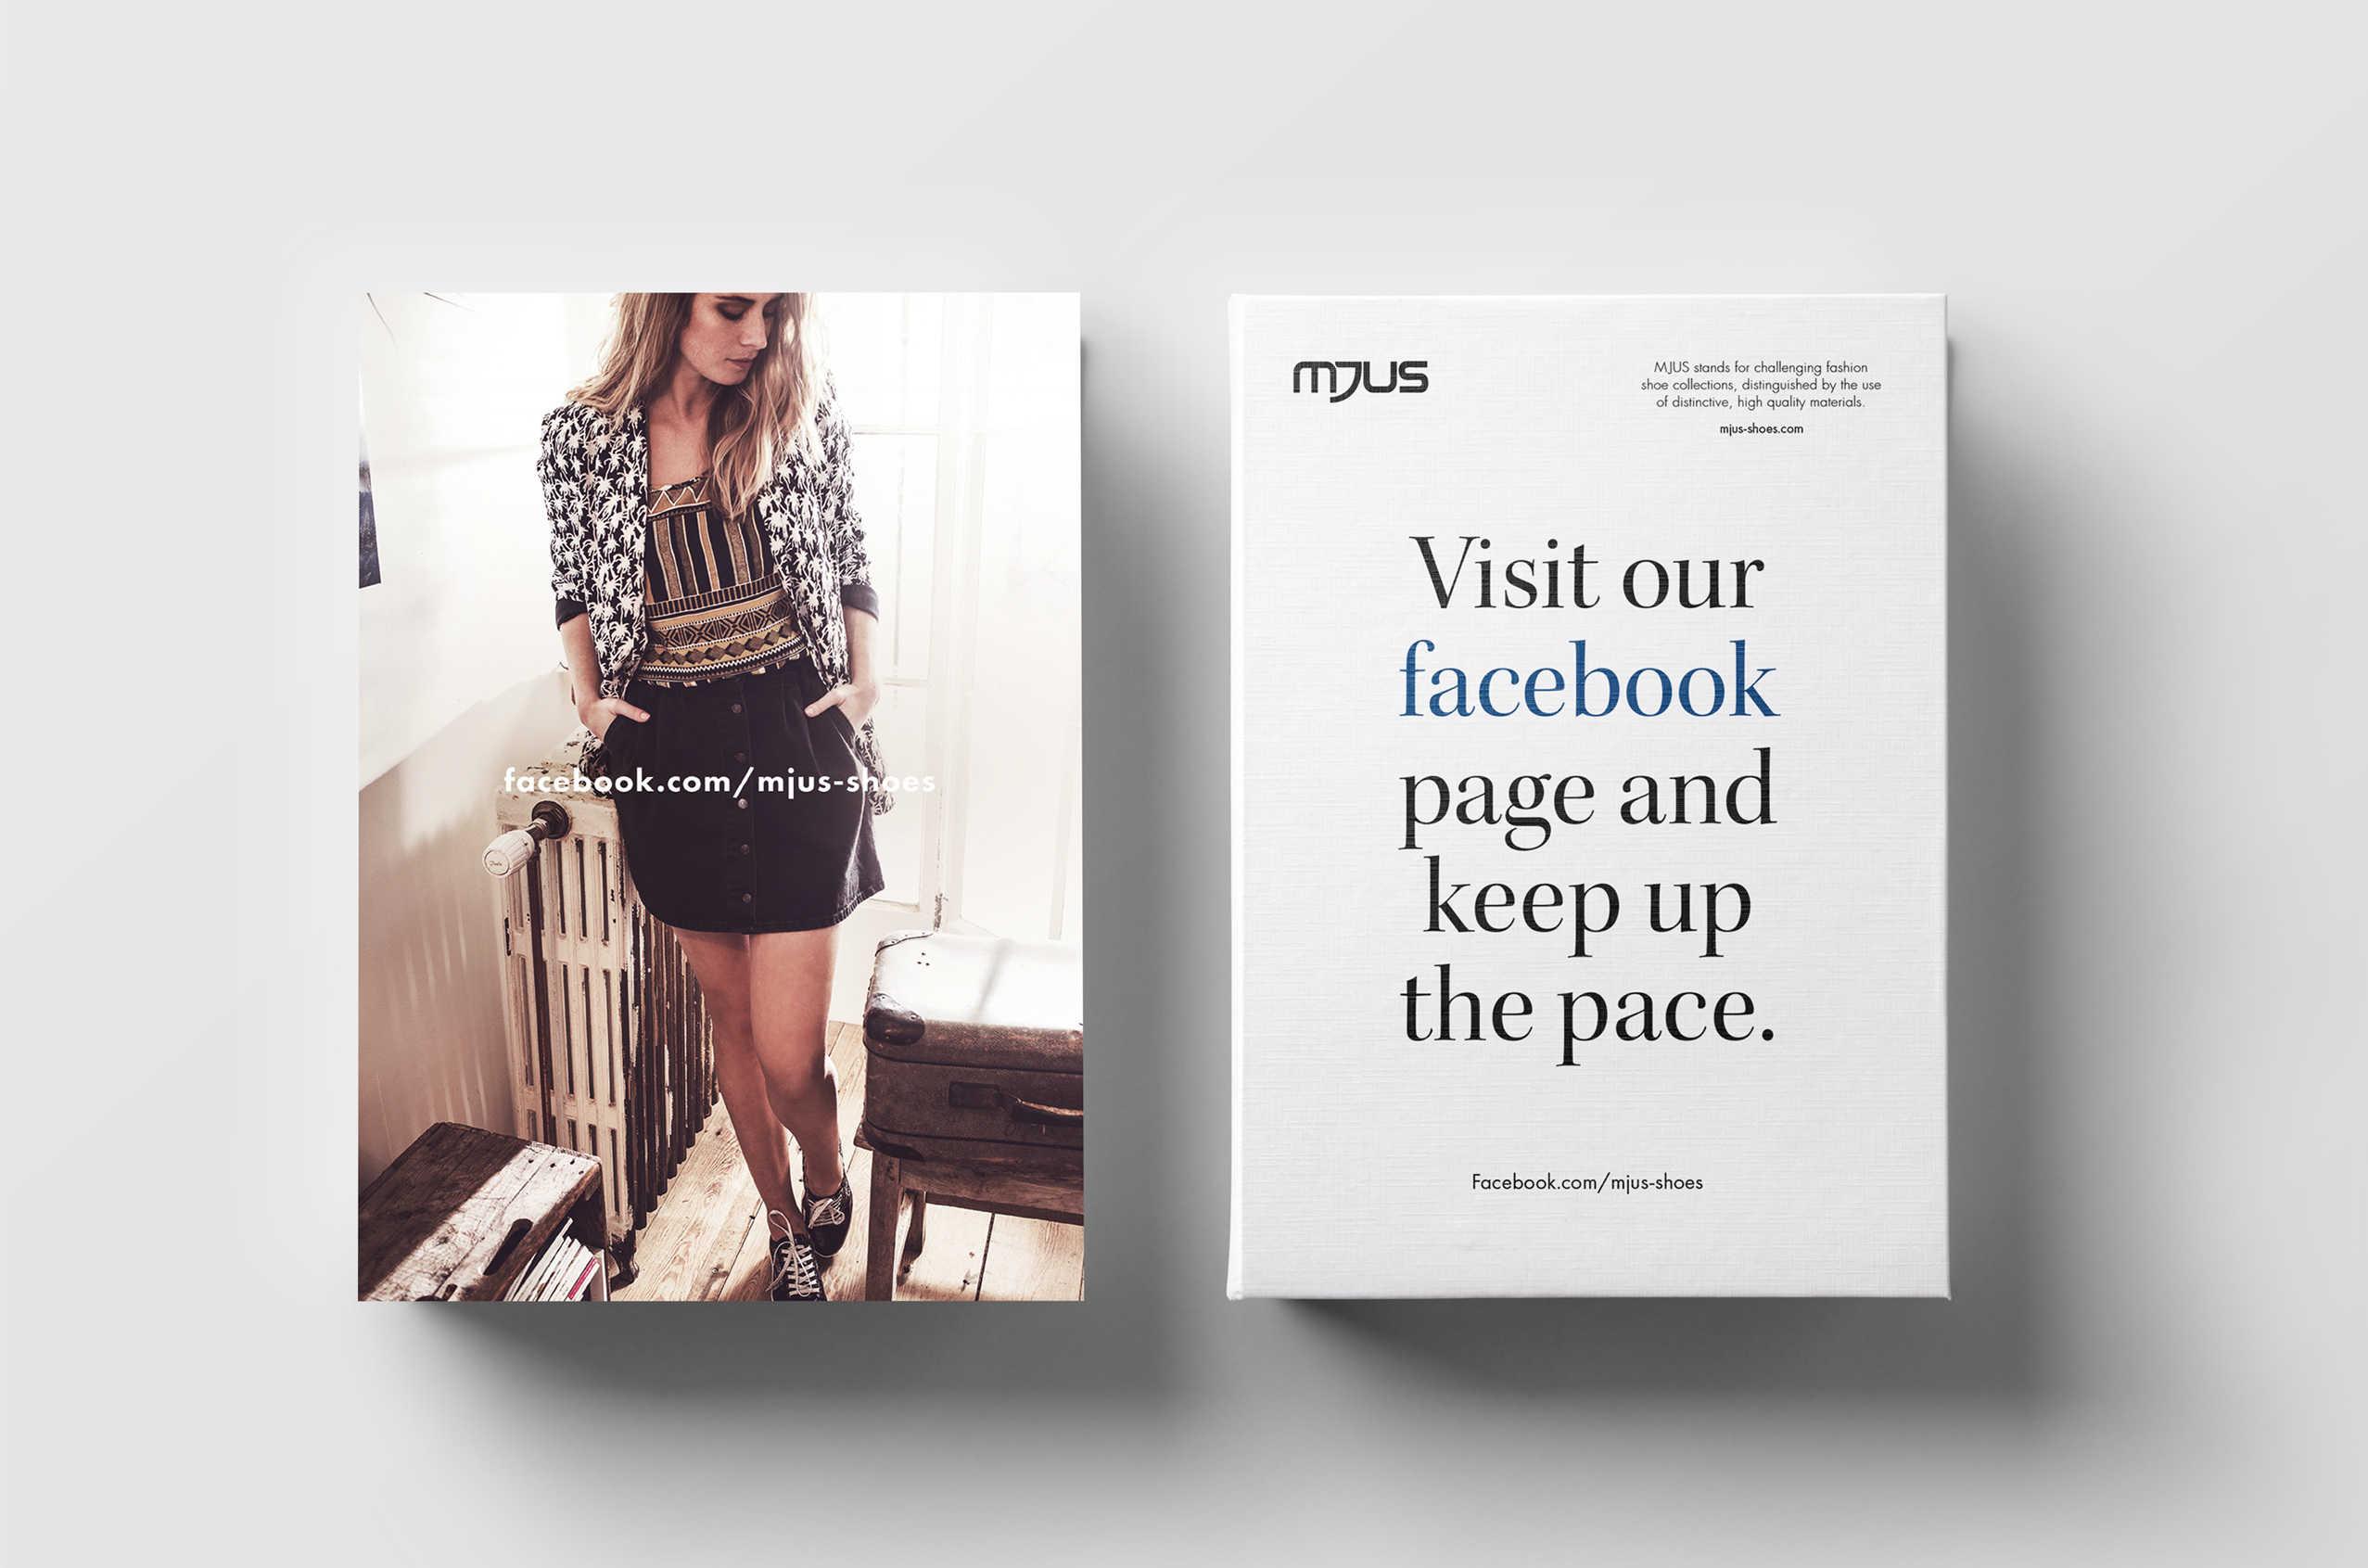 content_marketing_mjus_shoes_dutchgiraffe_04